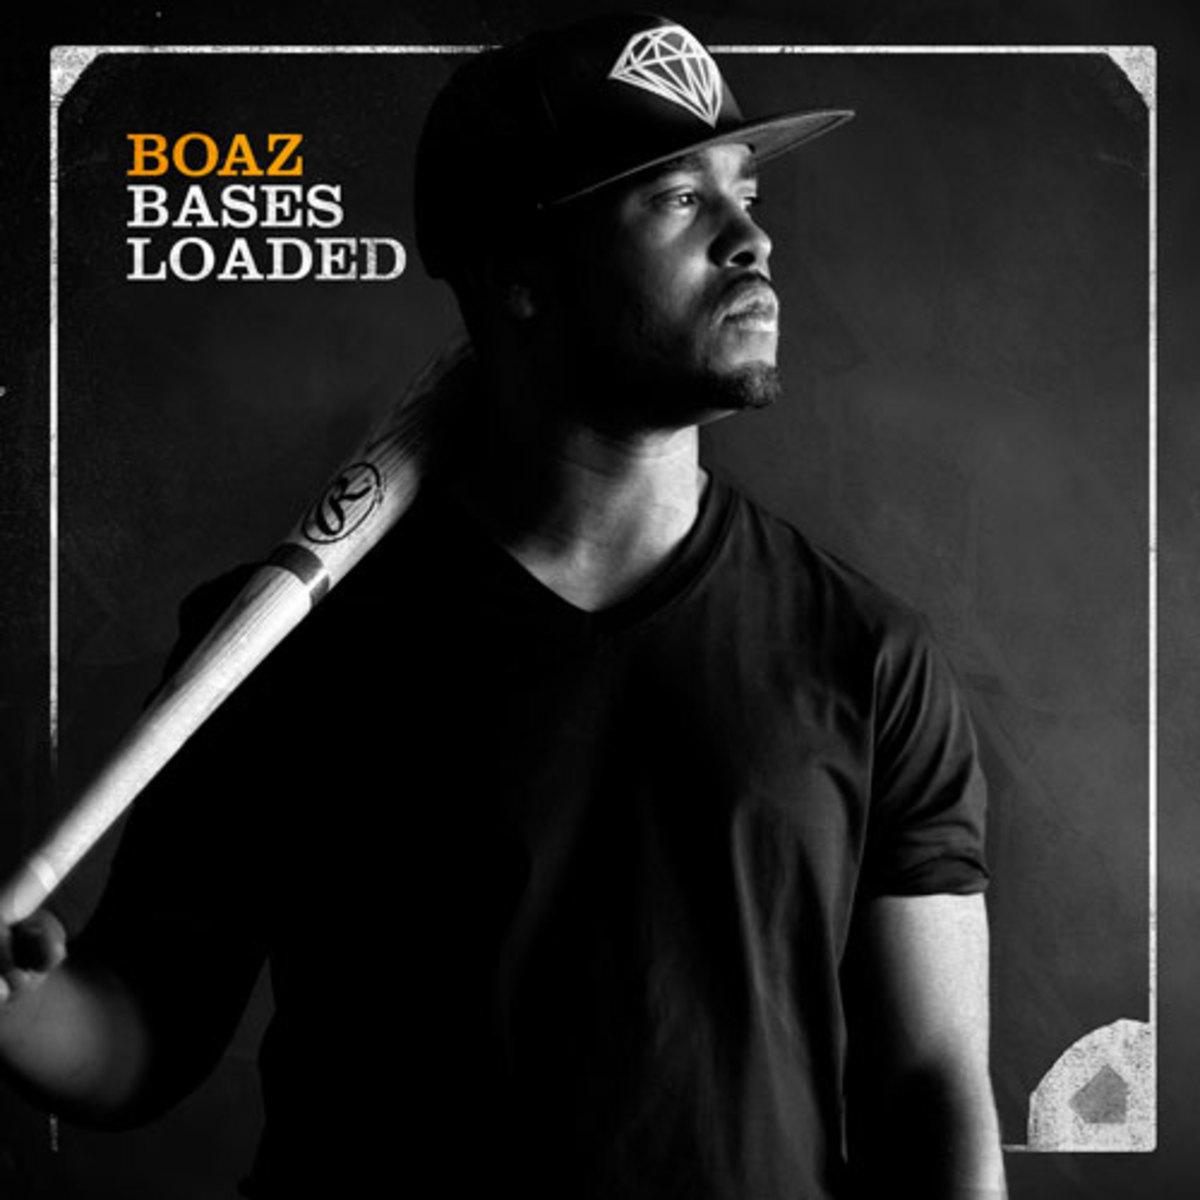 boaz-basedloaded.jpg